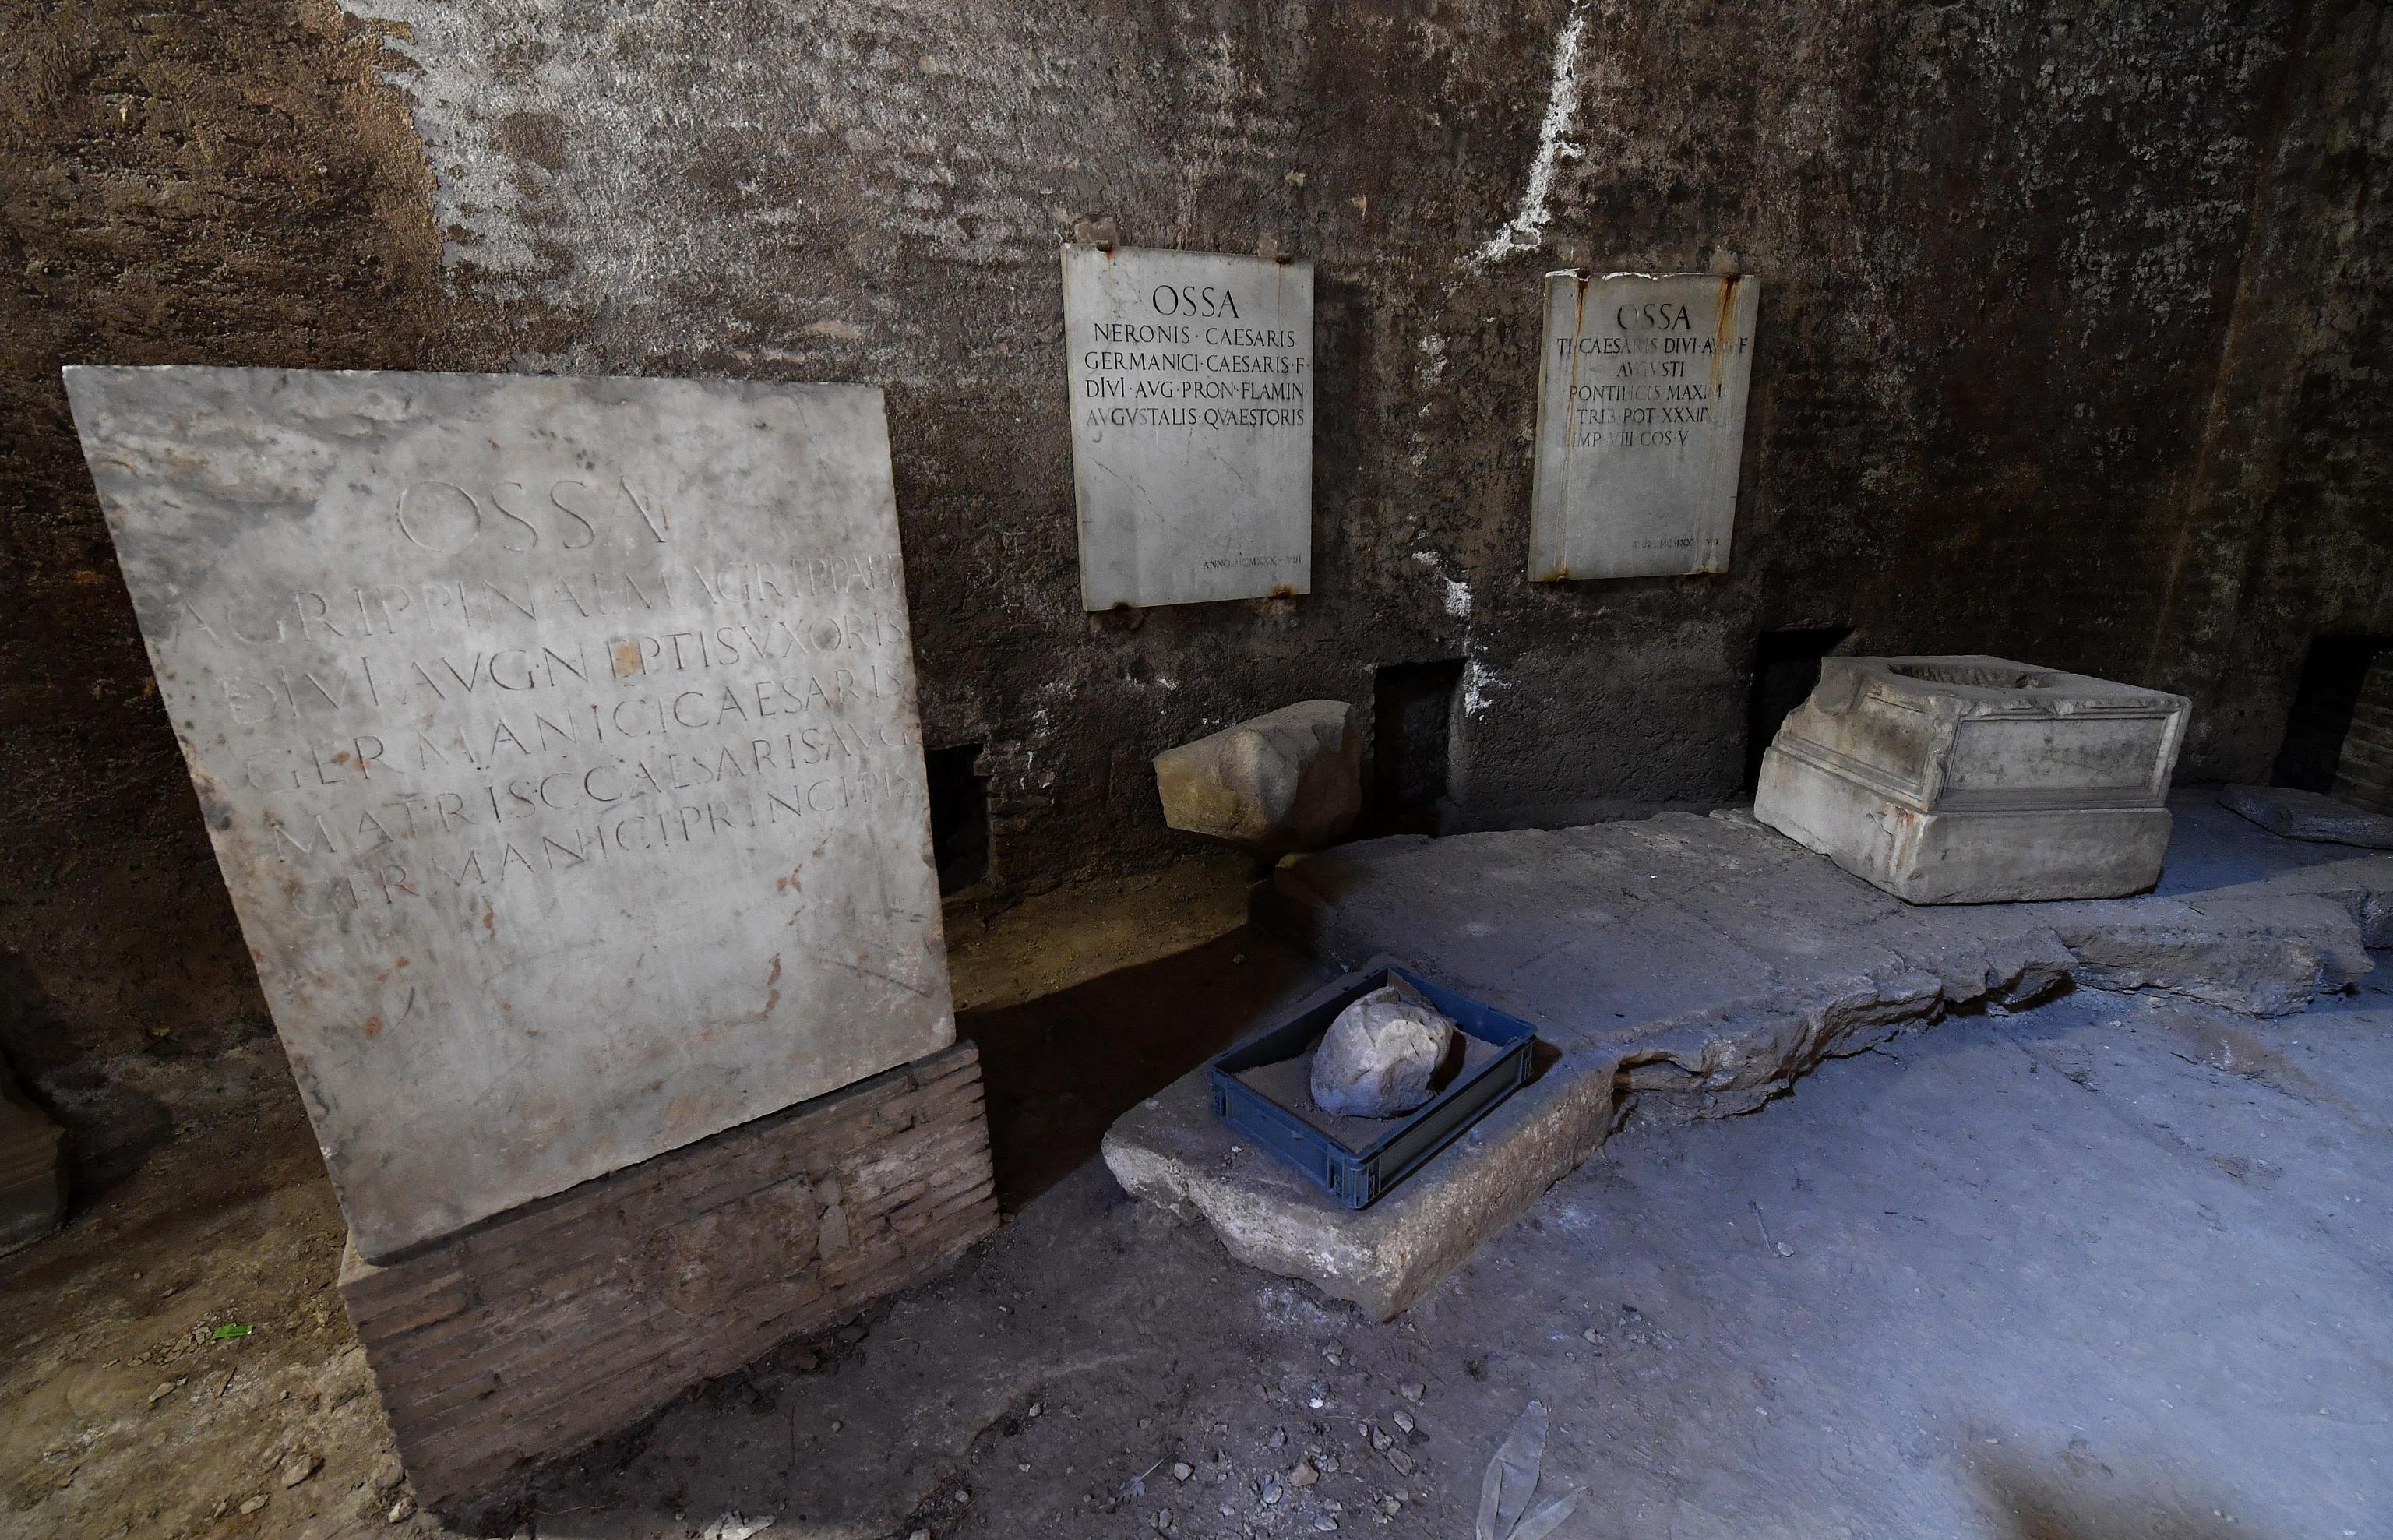 The History Blog » Blog Archive » Restoration of Mausoleum